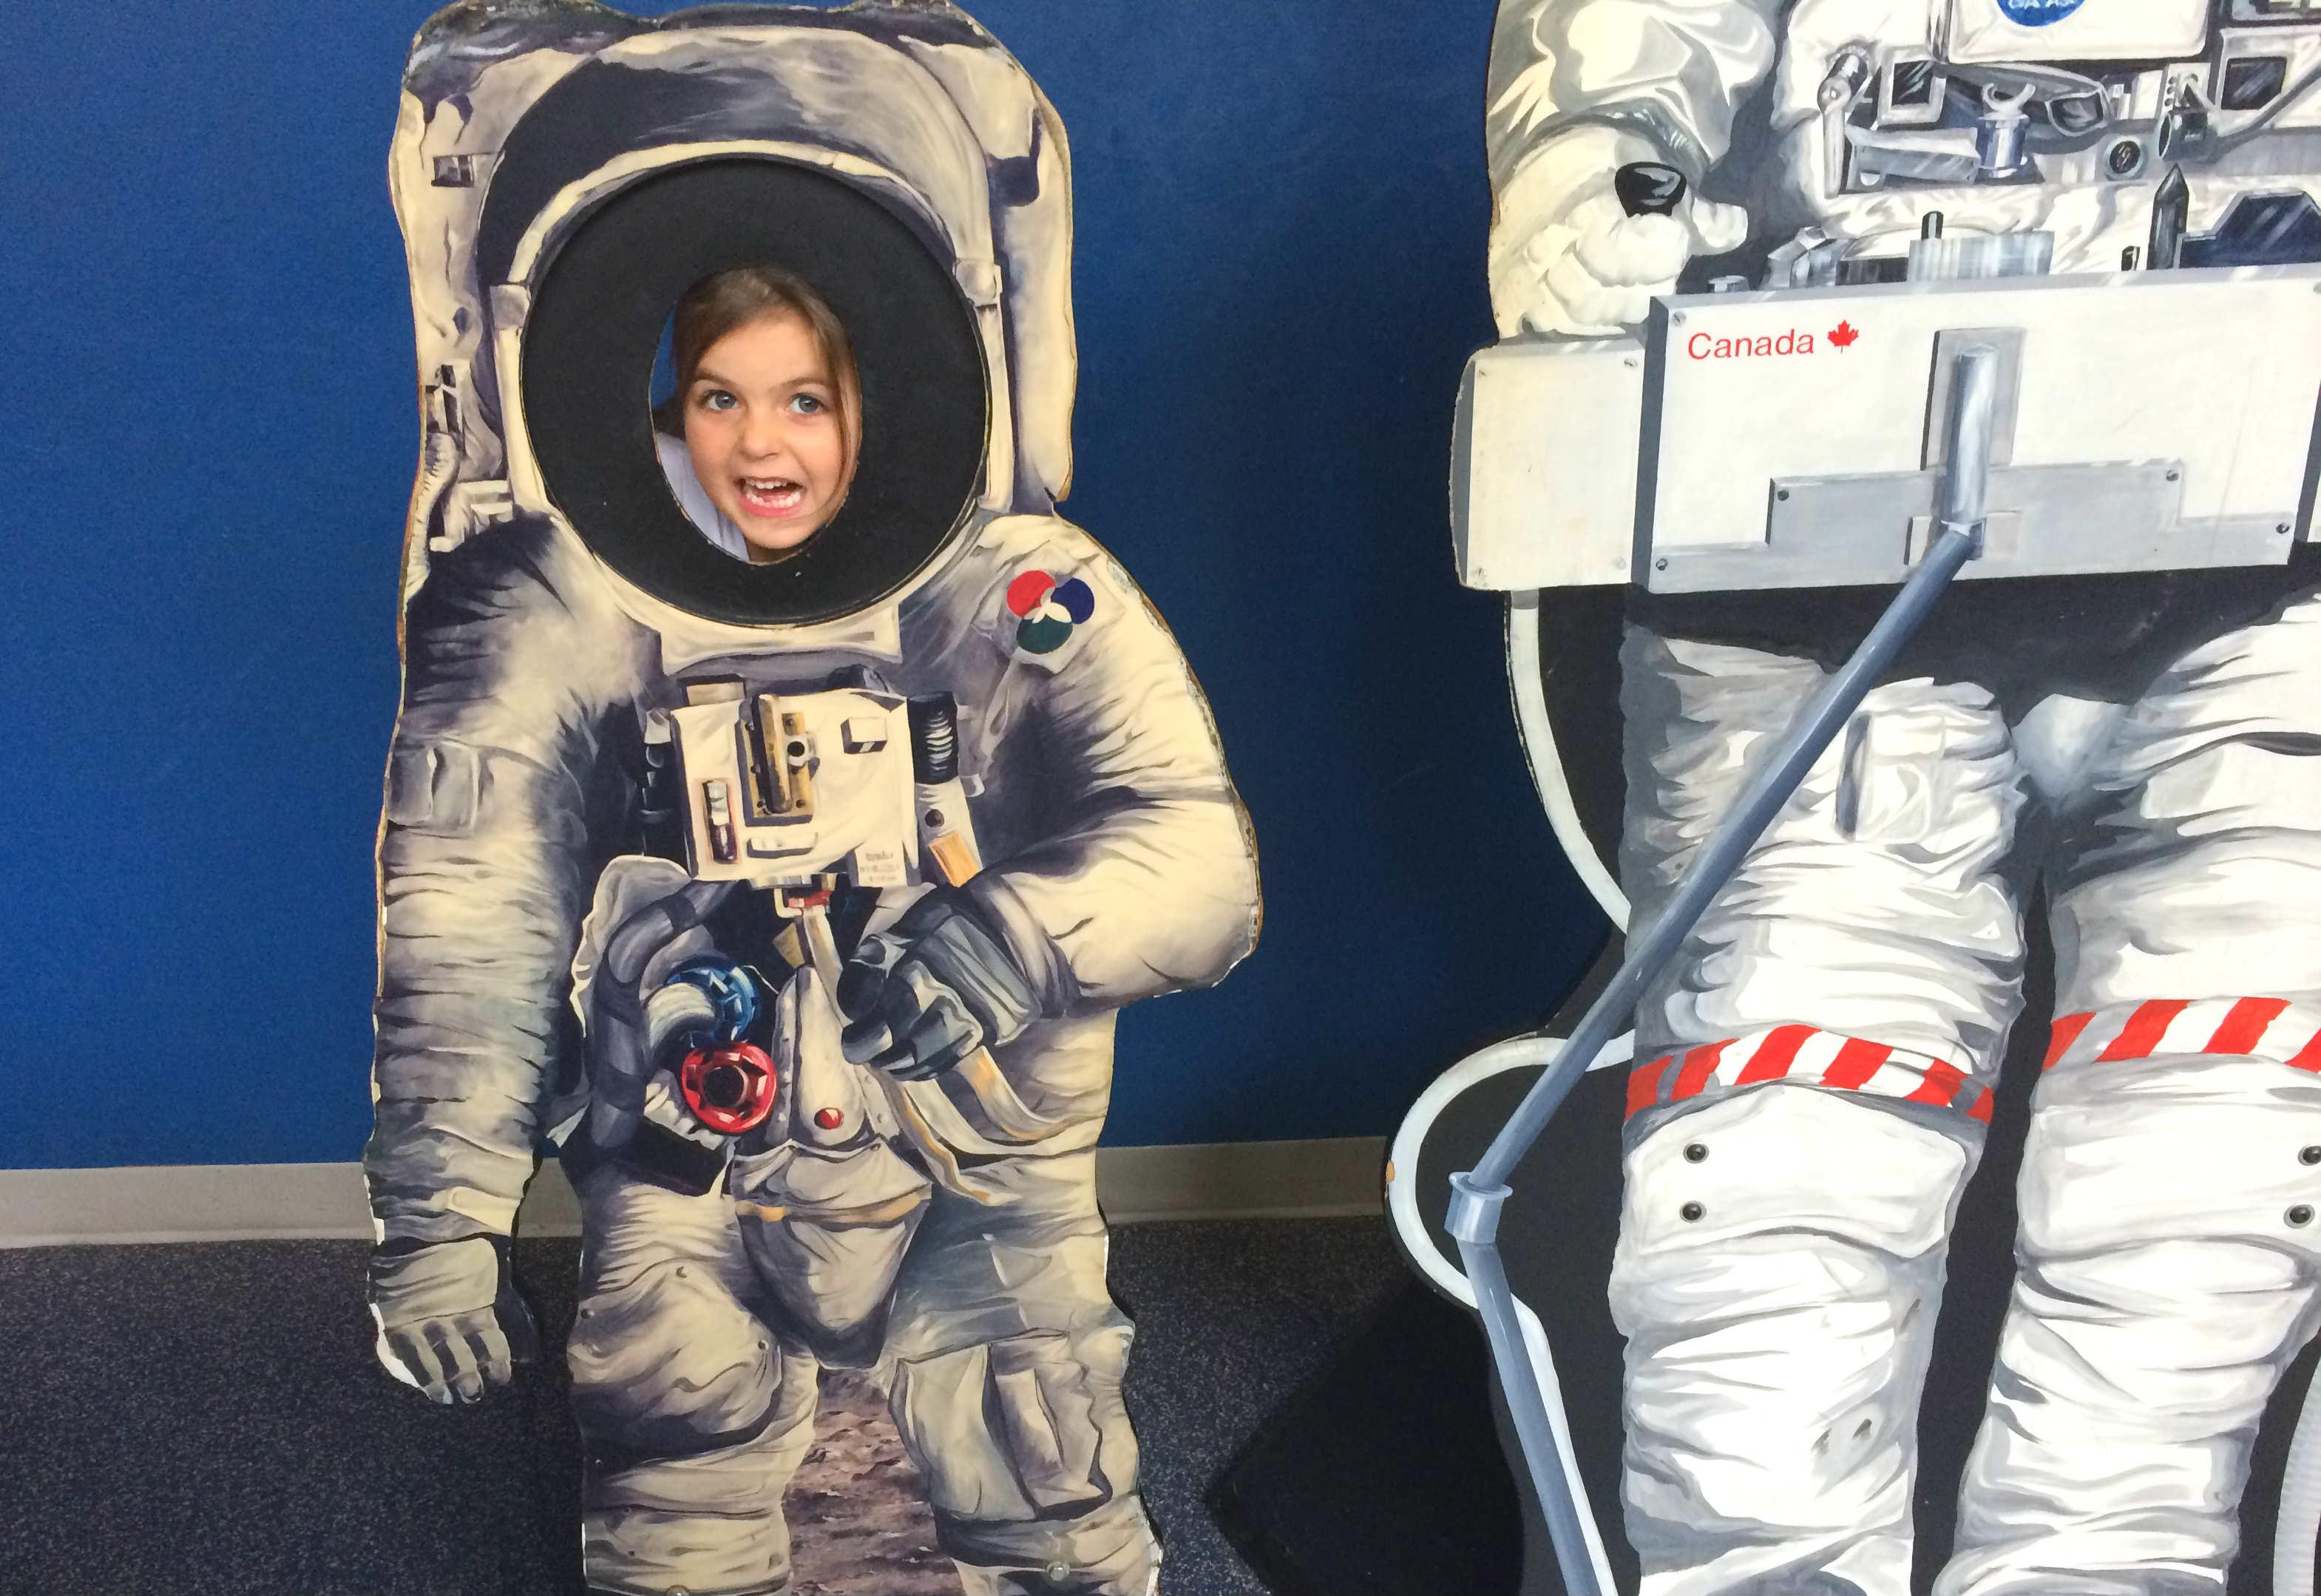 Beau the astronaut